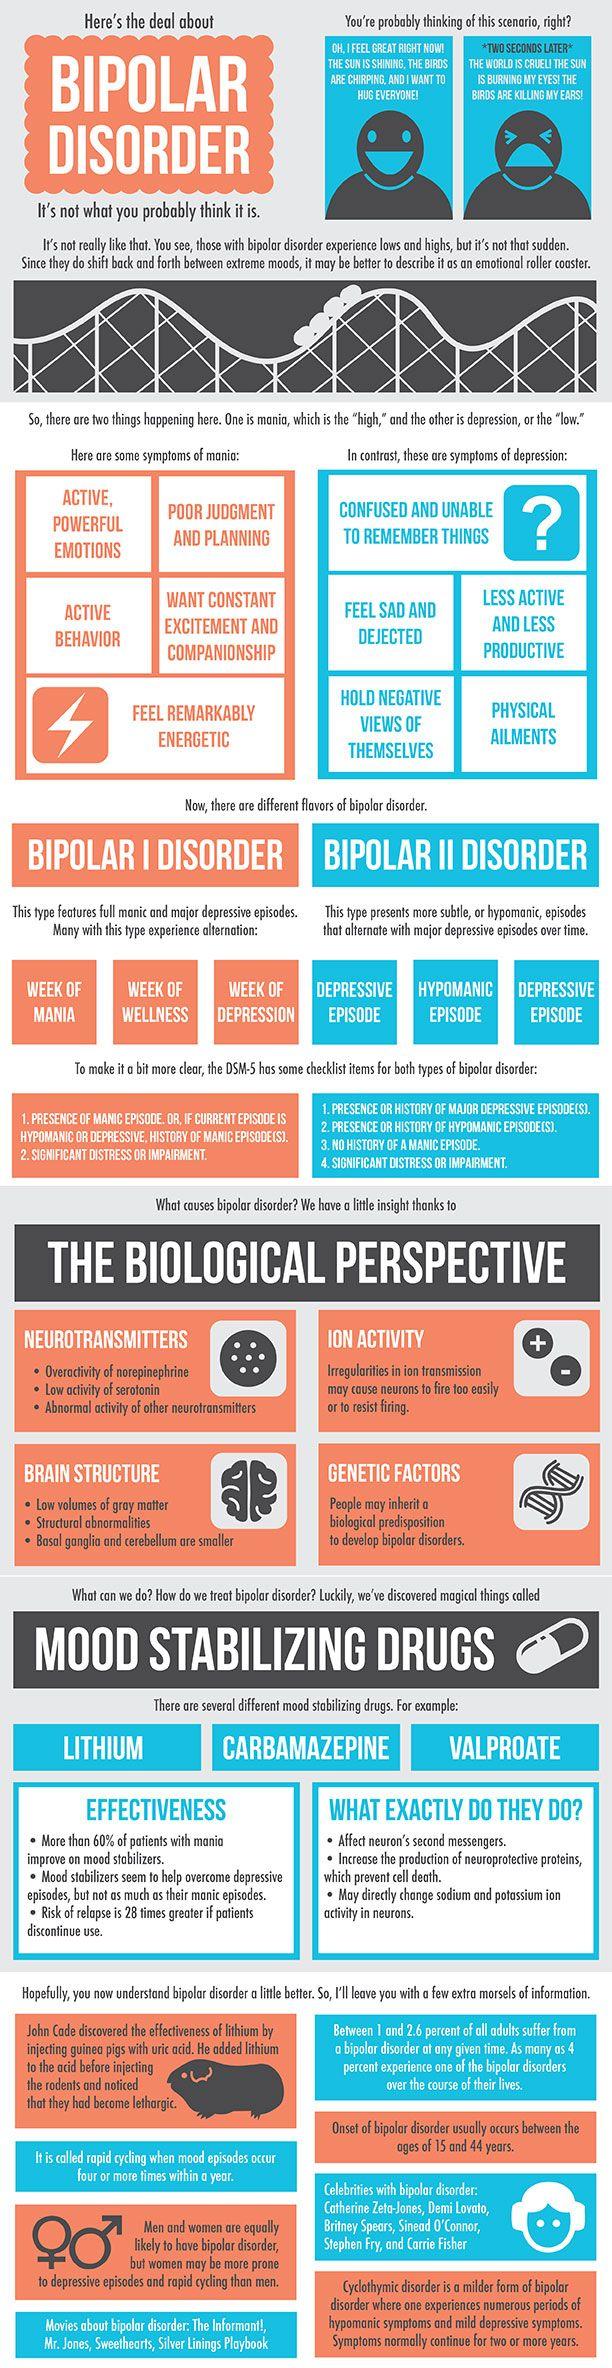 Bipolar Disorder Infographic.